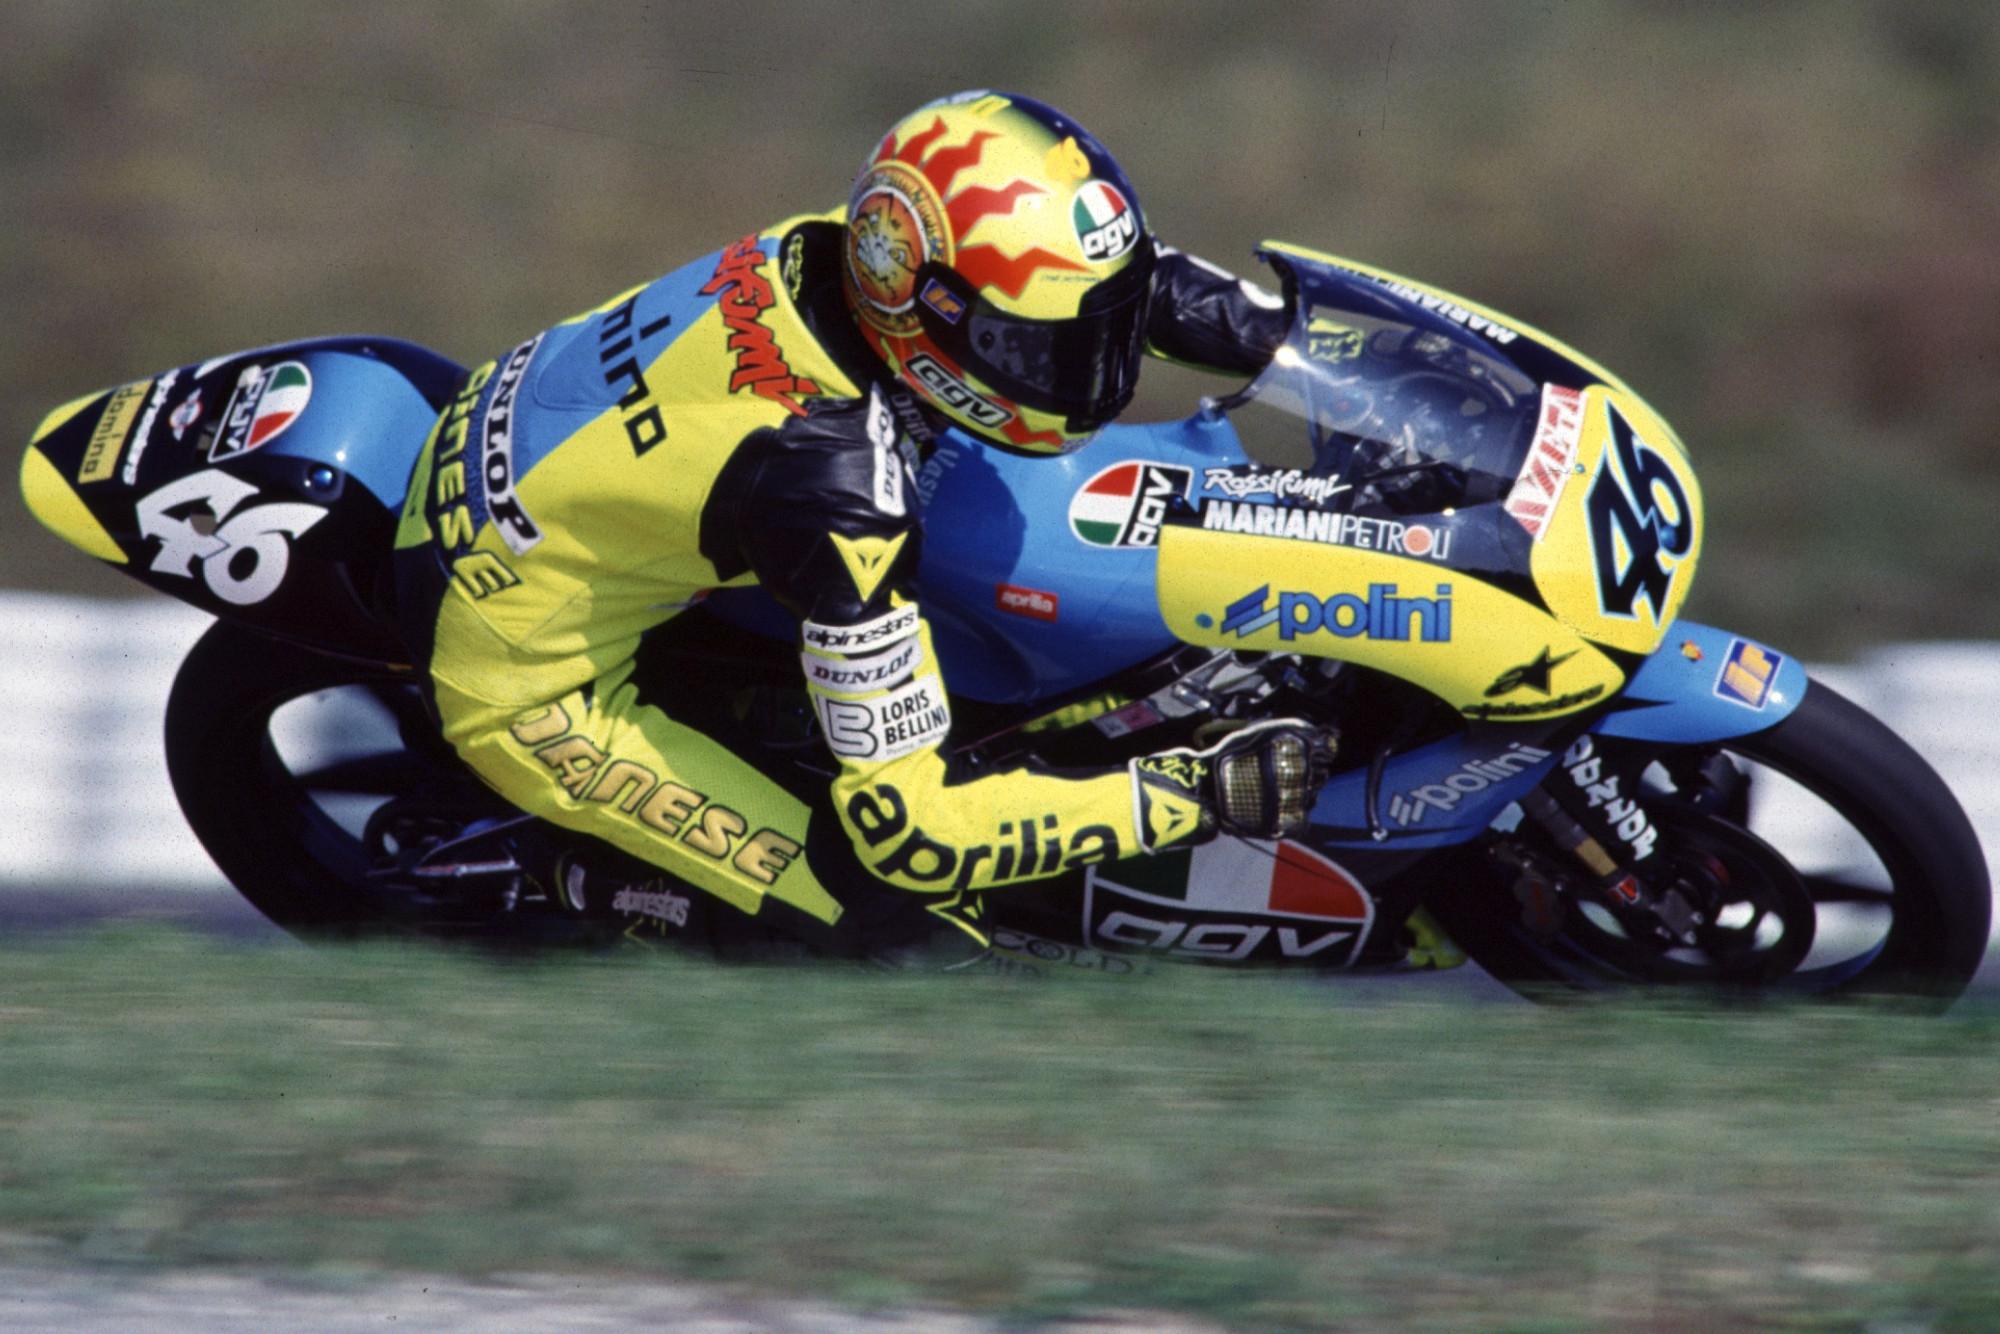 Valentino Rossi on his Aprillia MotoGP bike in 1996